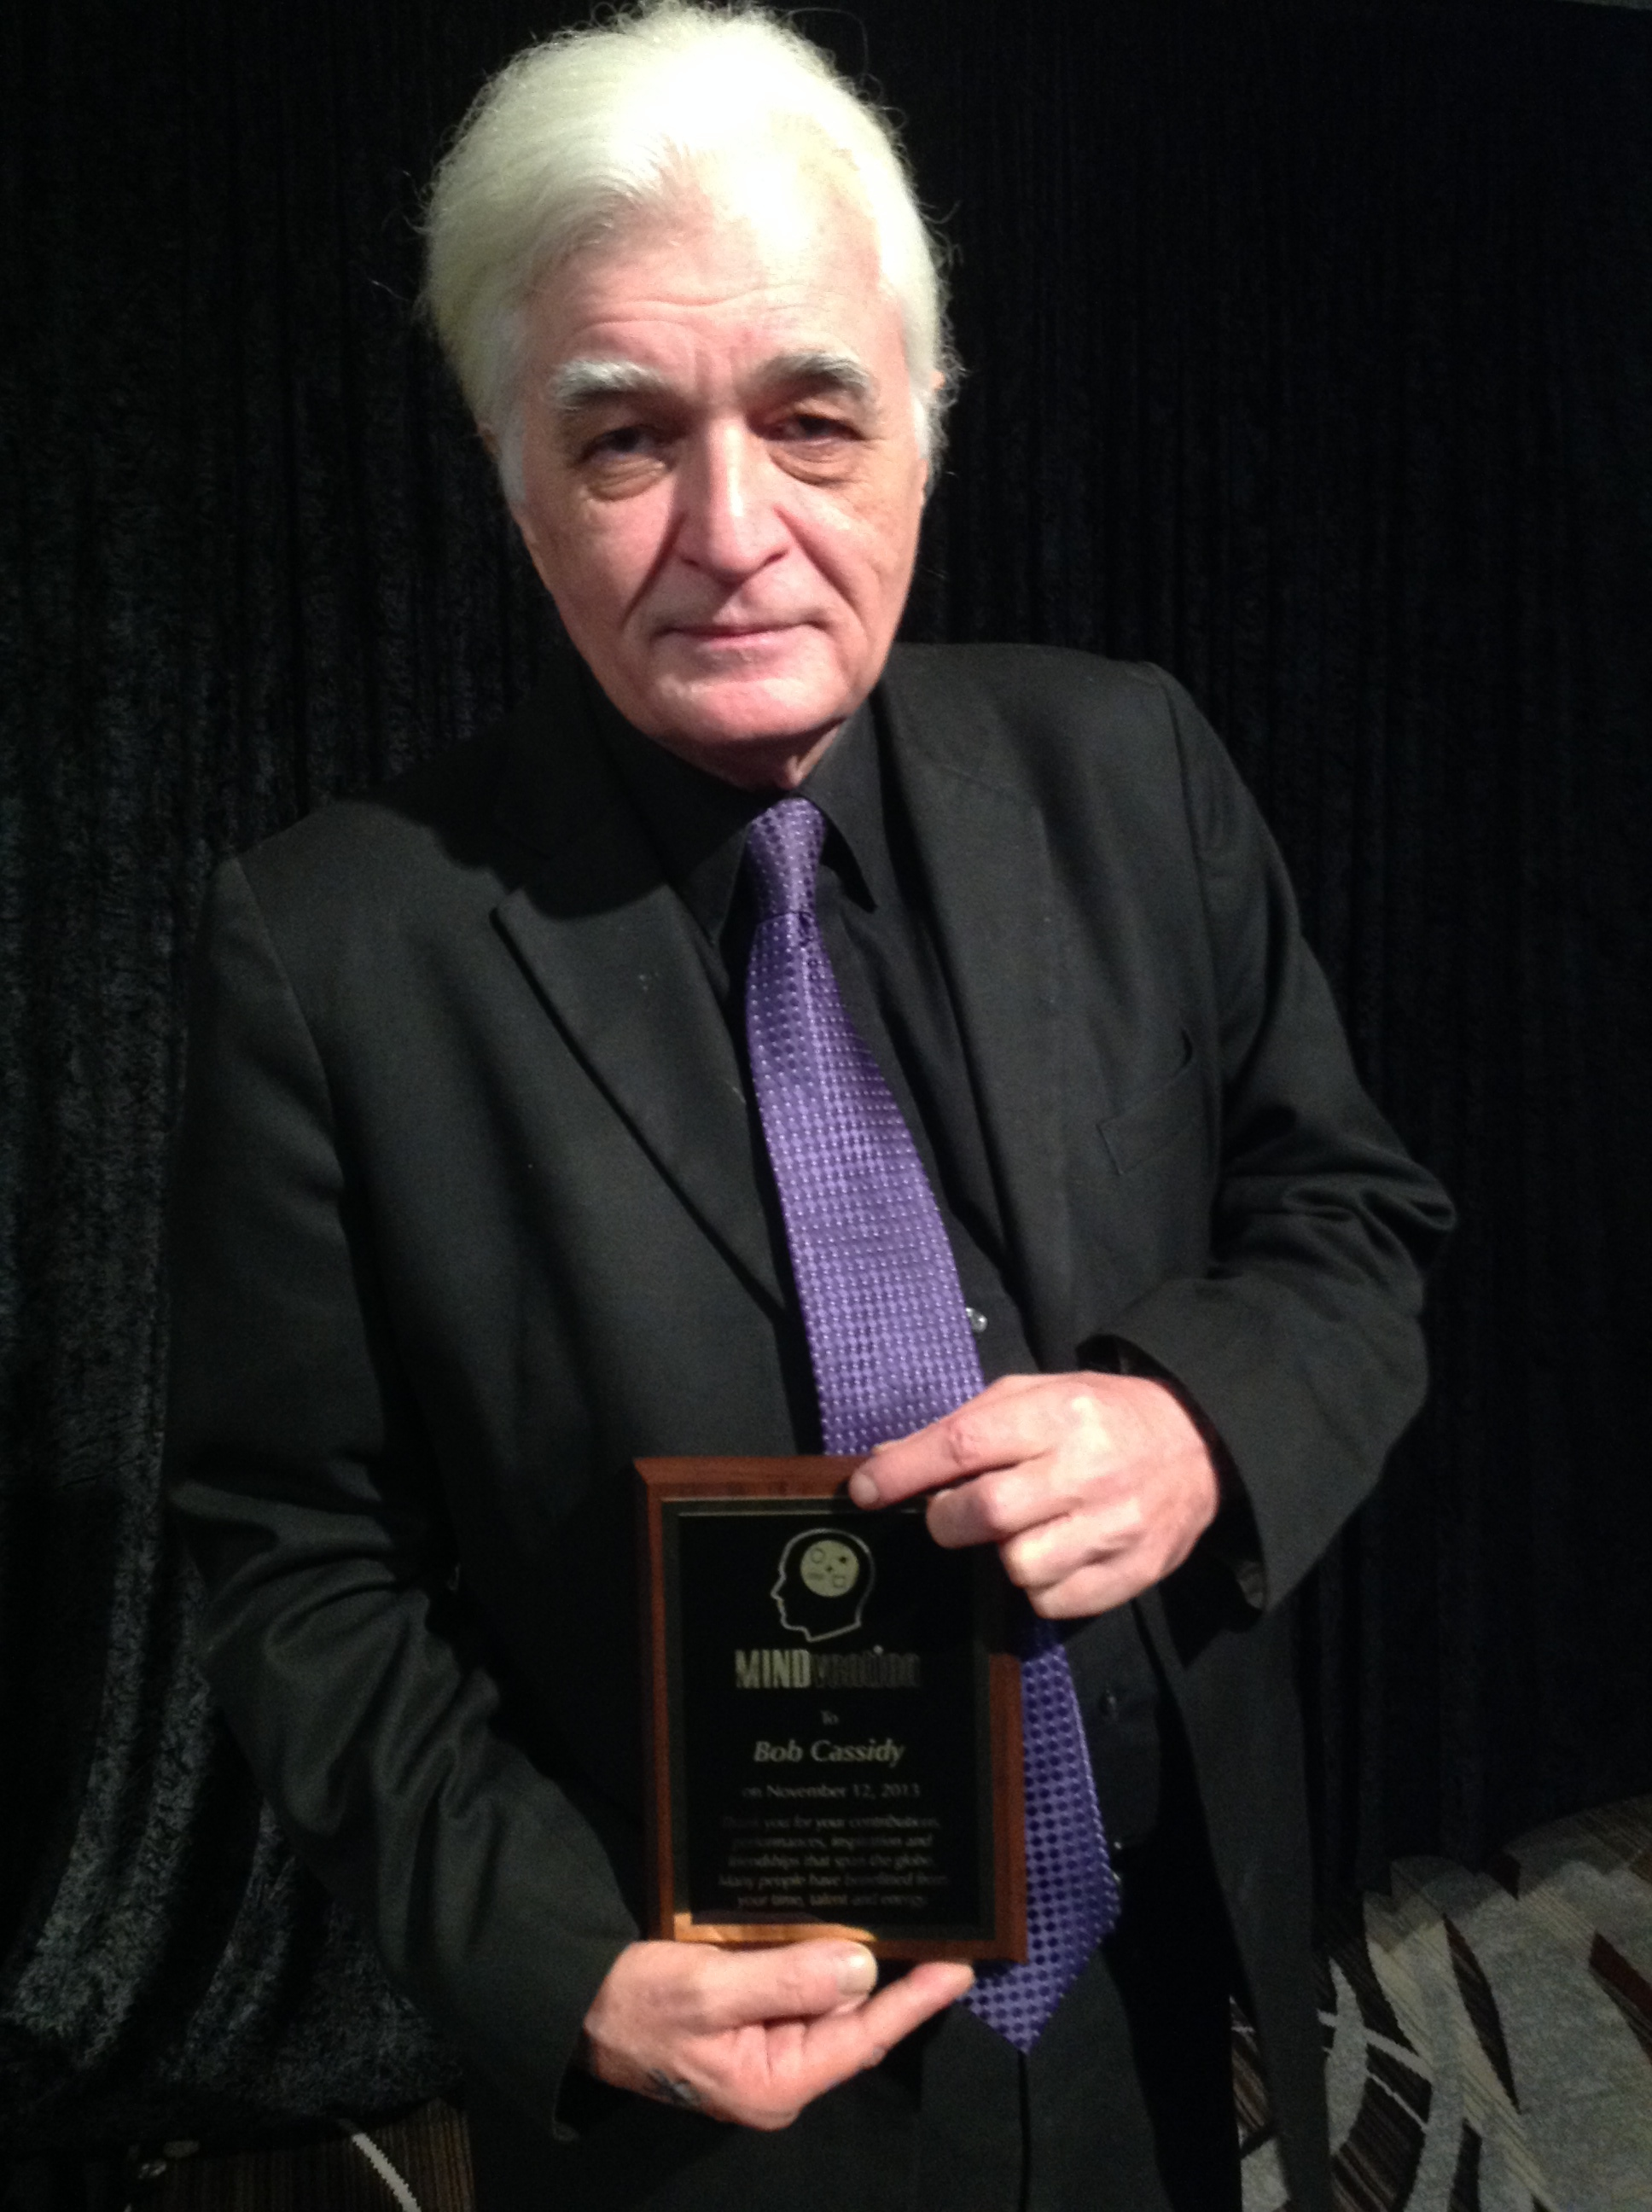 Bob Cassidy receives Lifetime Achievement Award